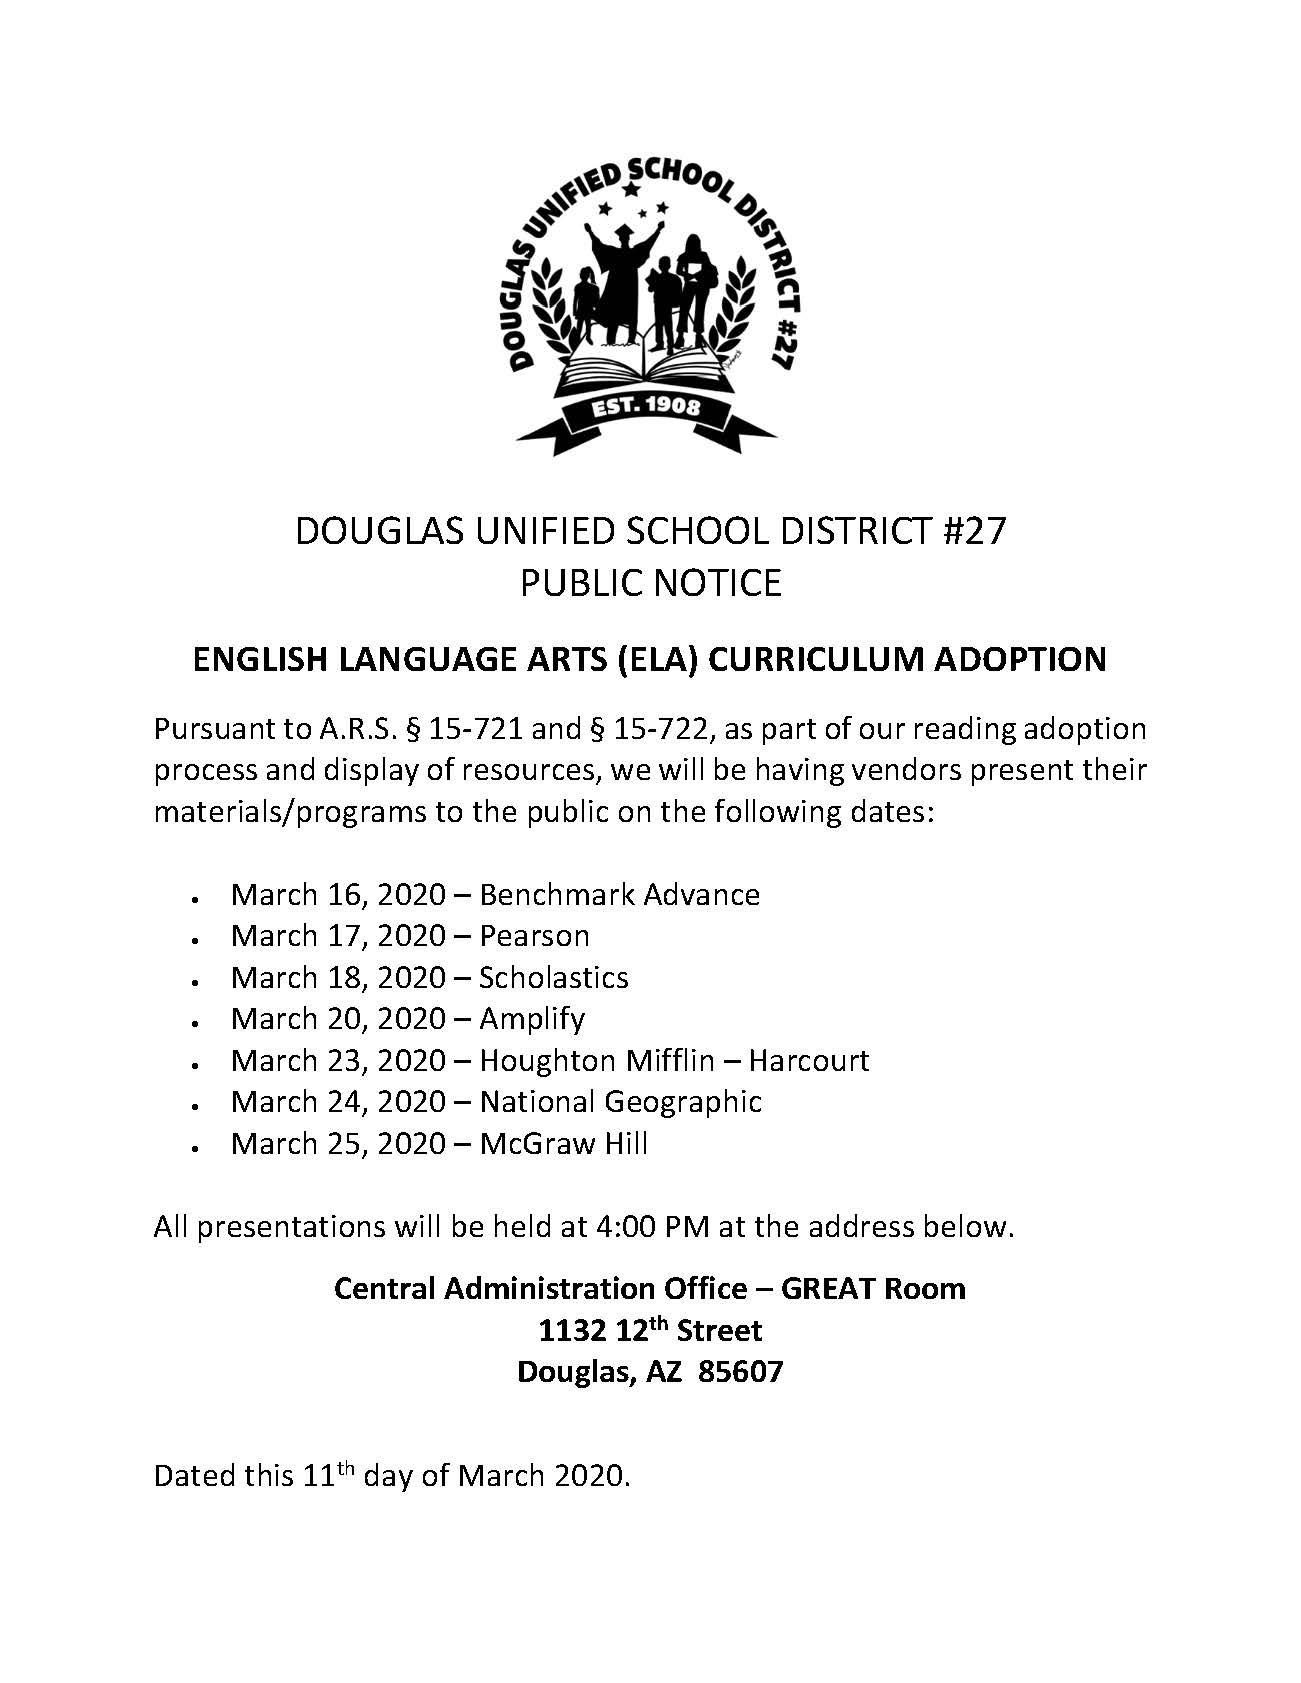 Stevenson Elementary School: English Language Arts (Ela With Mifflin County School District Calender 20 21